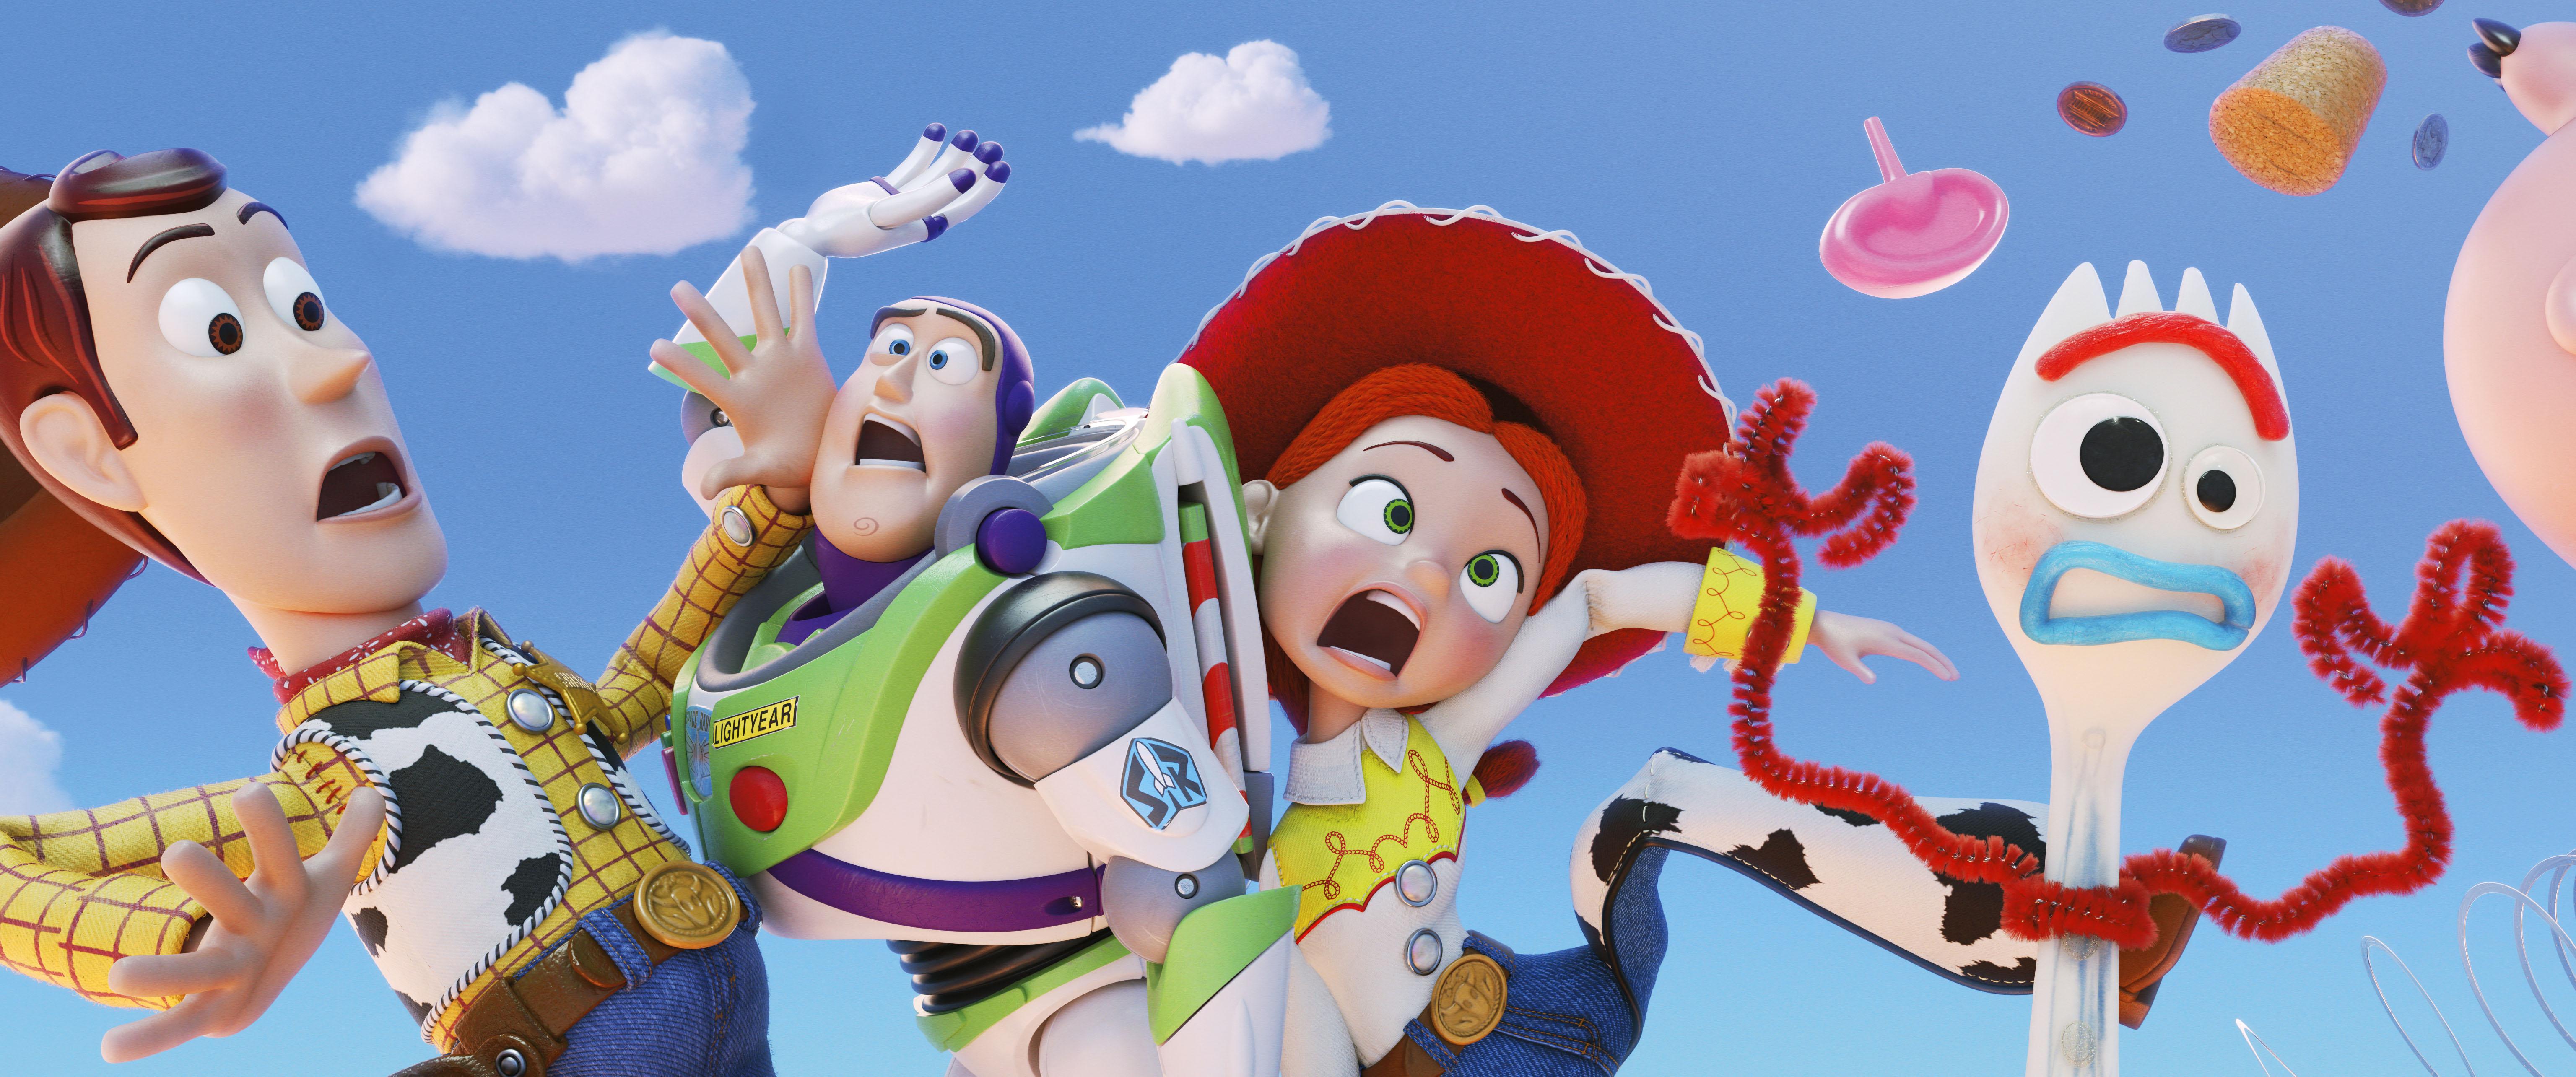 Toy Story 4 - La Lista - 4 - June/July 2019